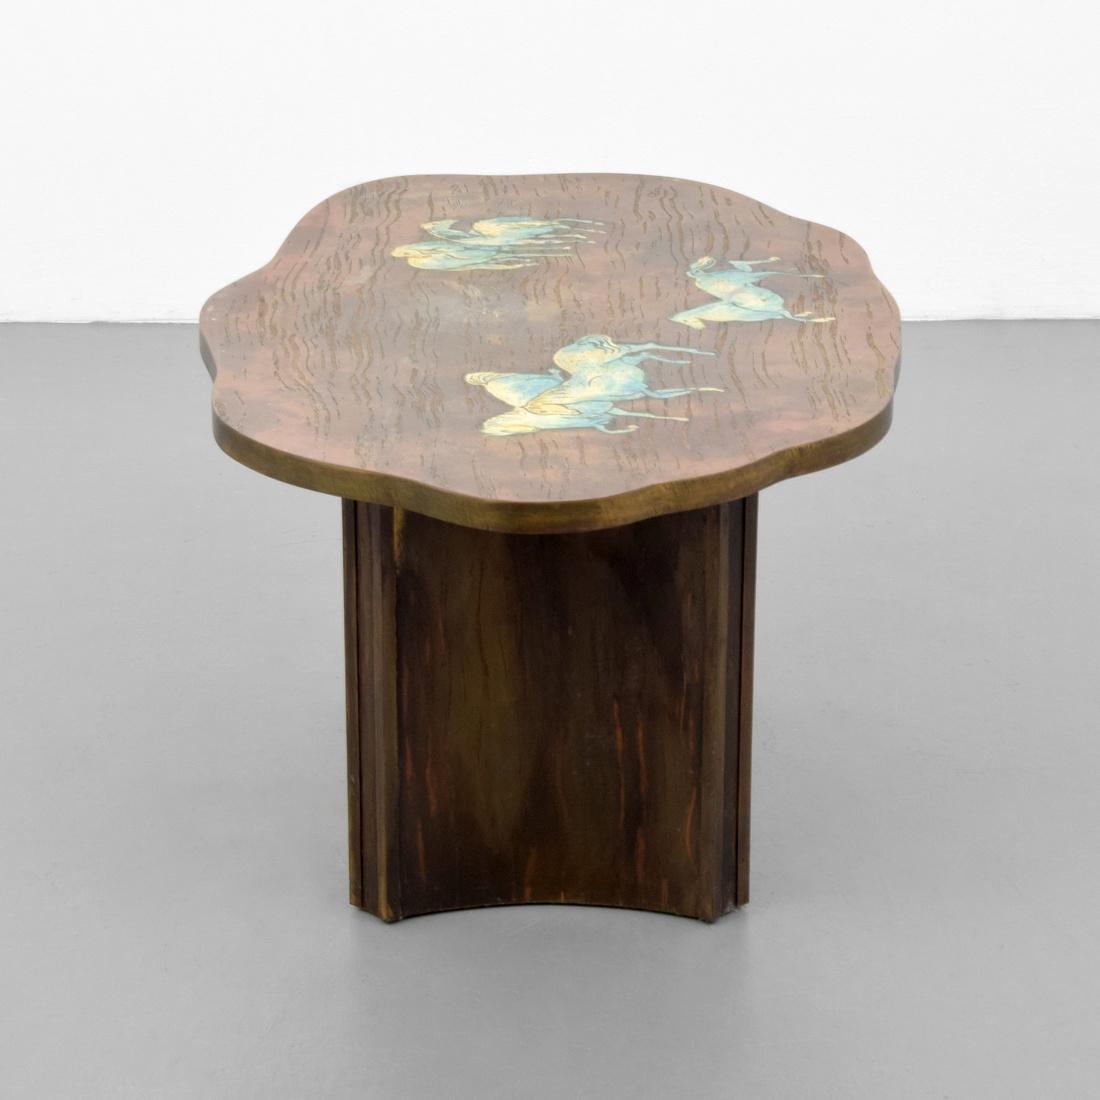 Rare Philip & Kelvin LaVerne Occasional Table - 5